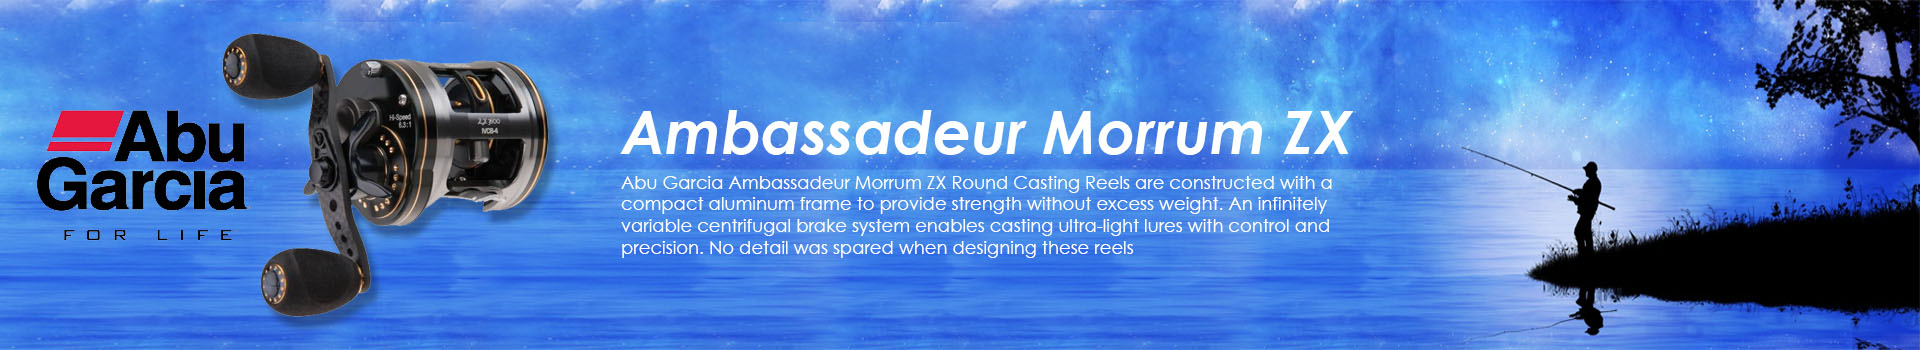 Abu-Garcia-Ambassadeur-Morrum-ZX-Round-Casting-Reels